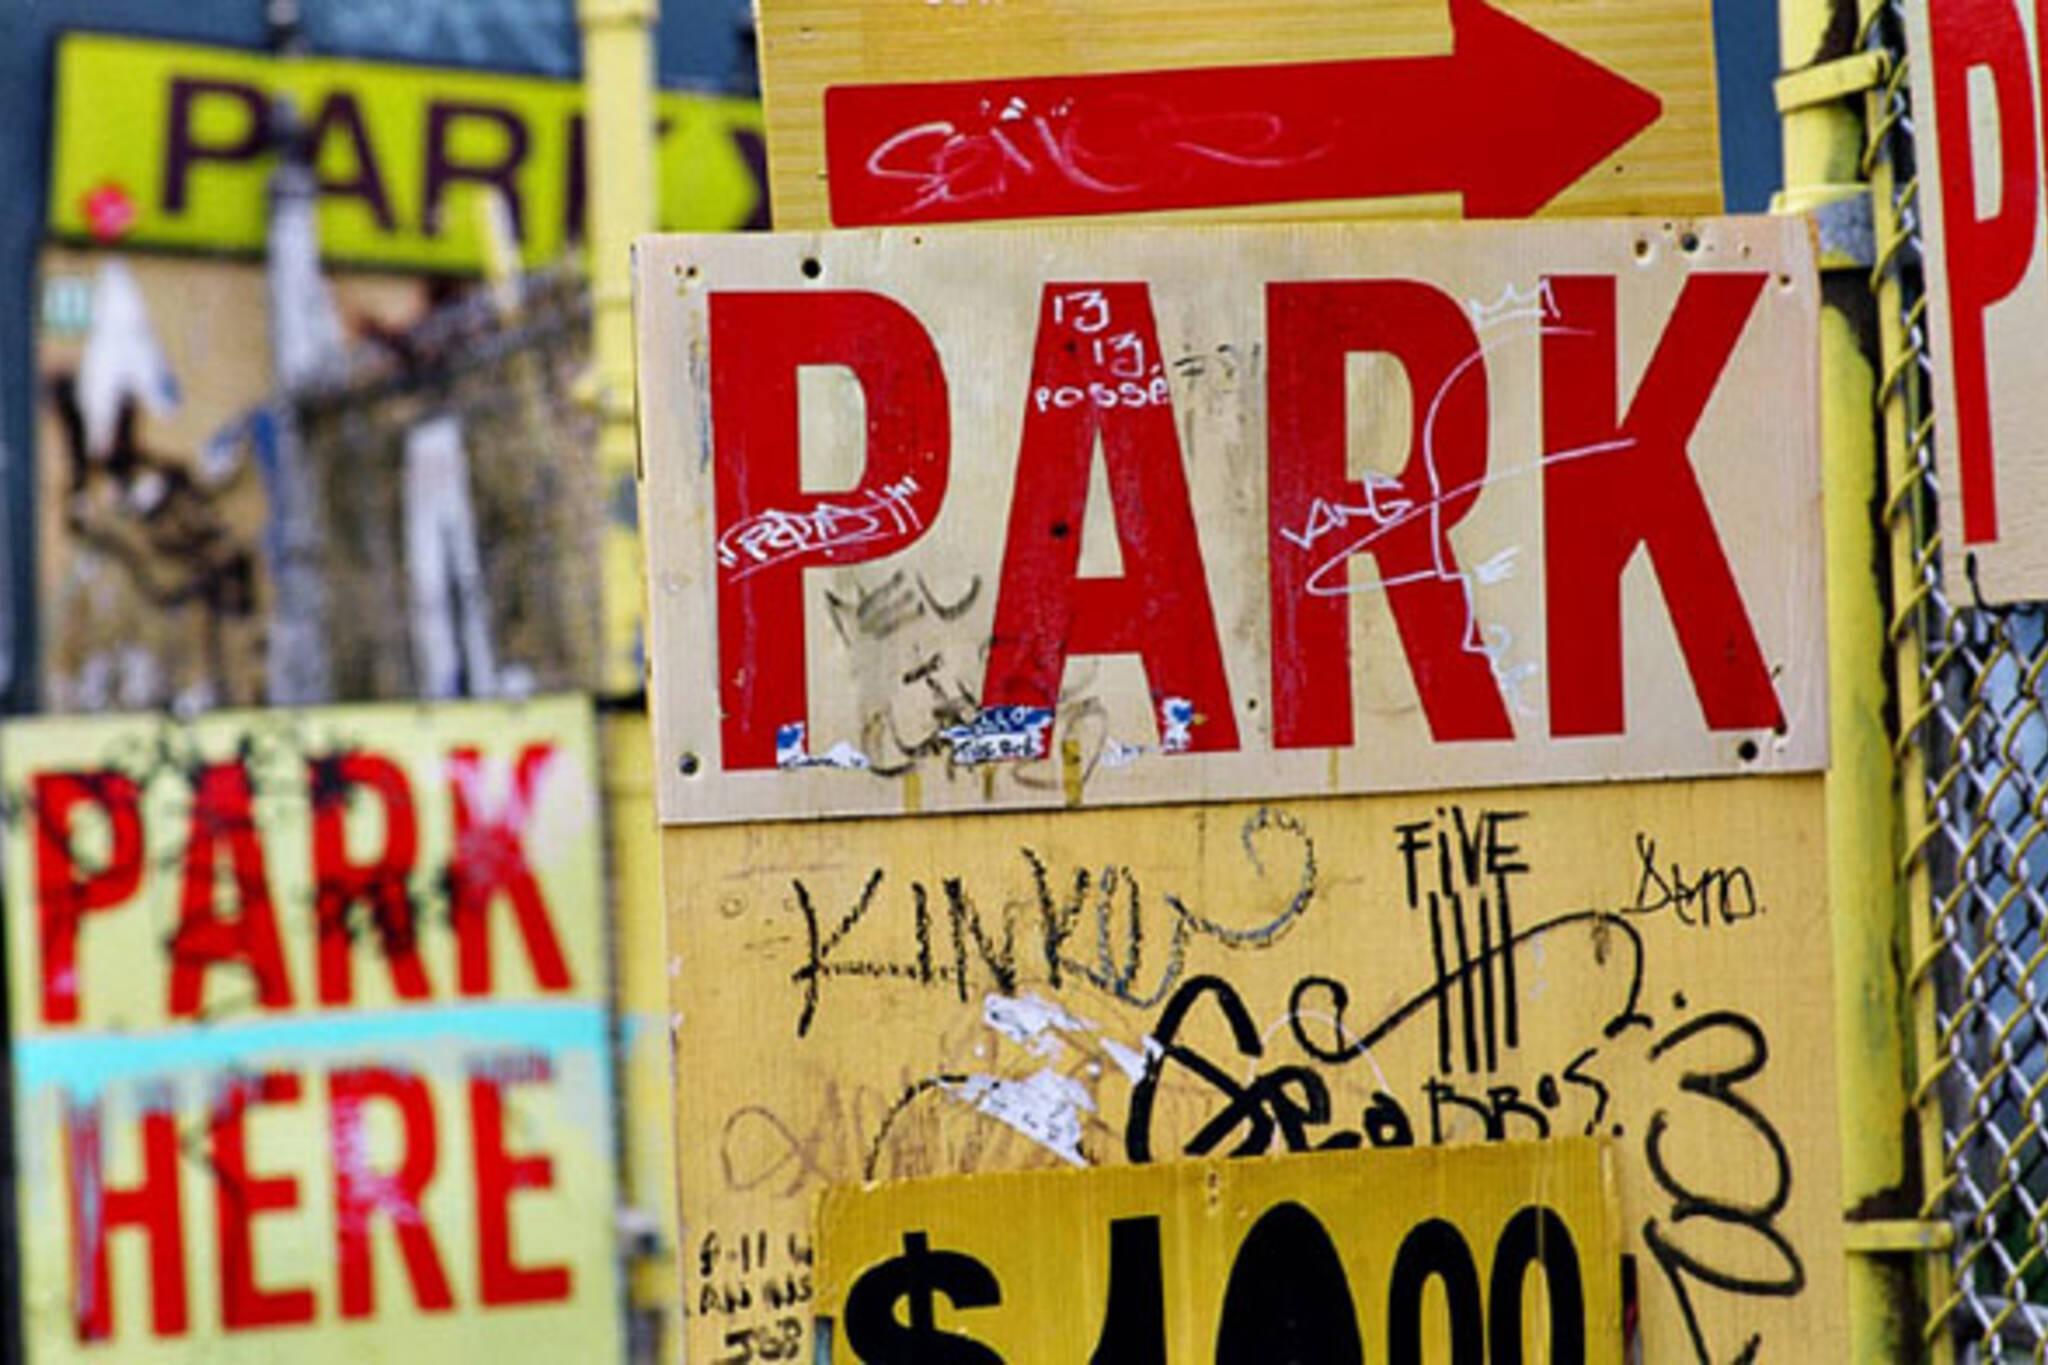 blogTO Morning Brew Parking Signs